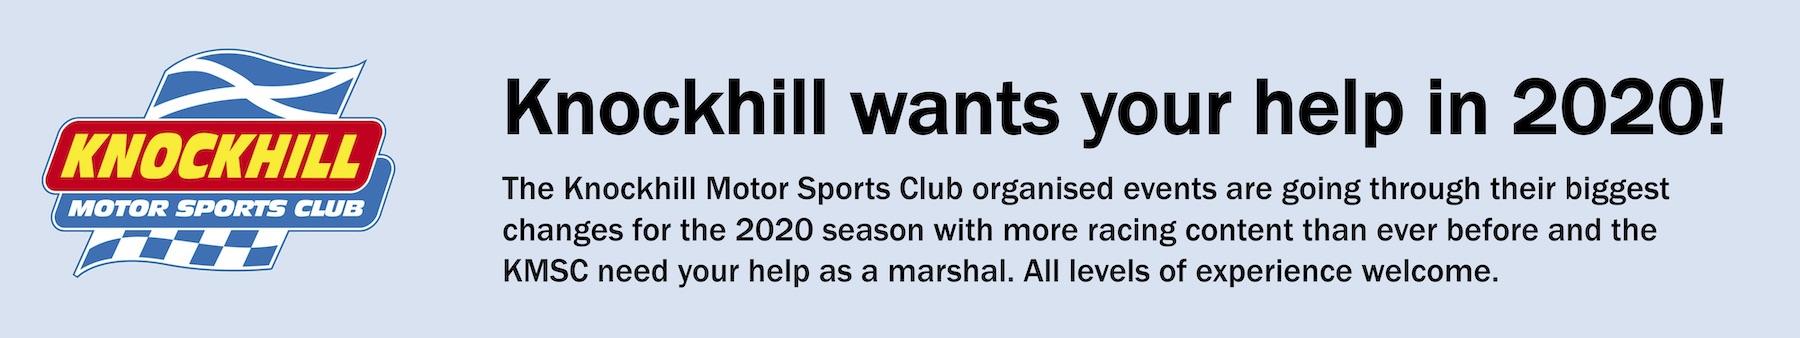 Knockhill Motor Sports Club